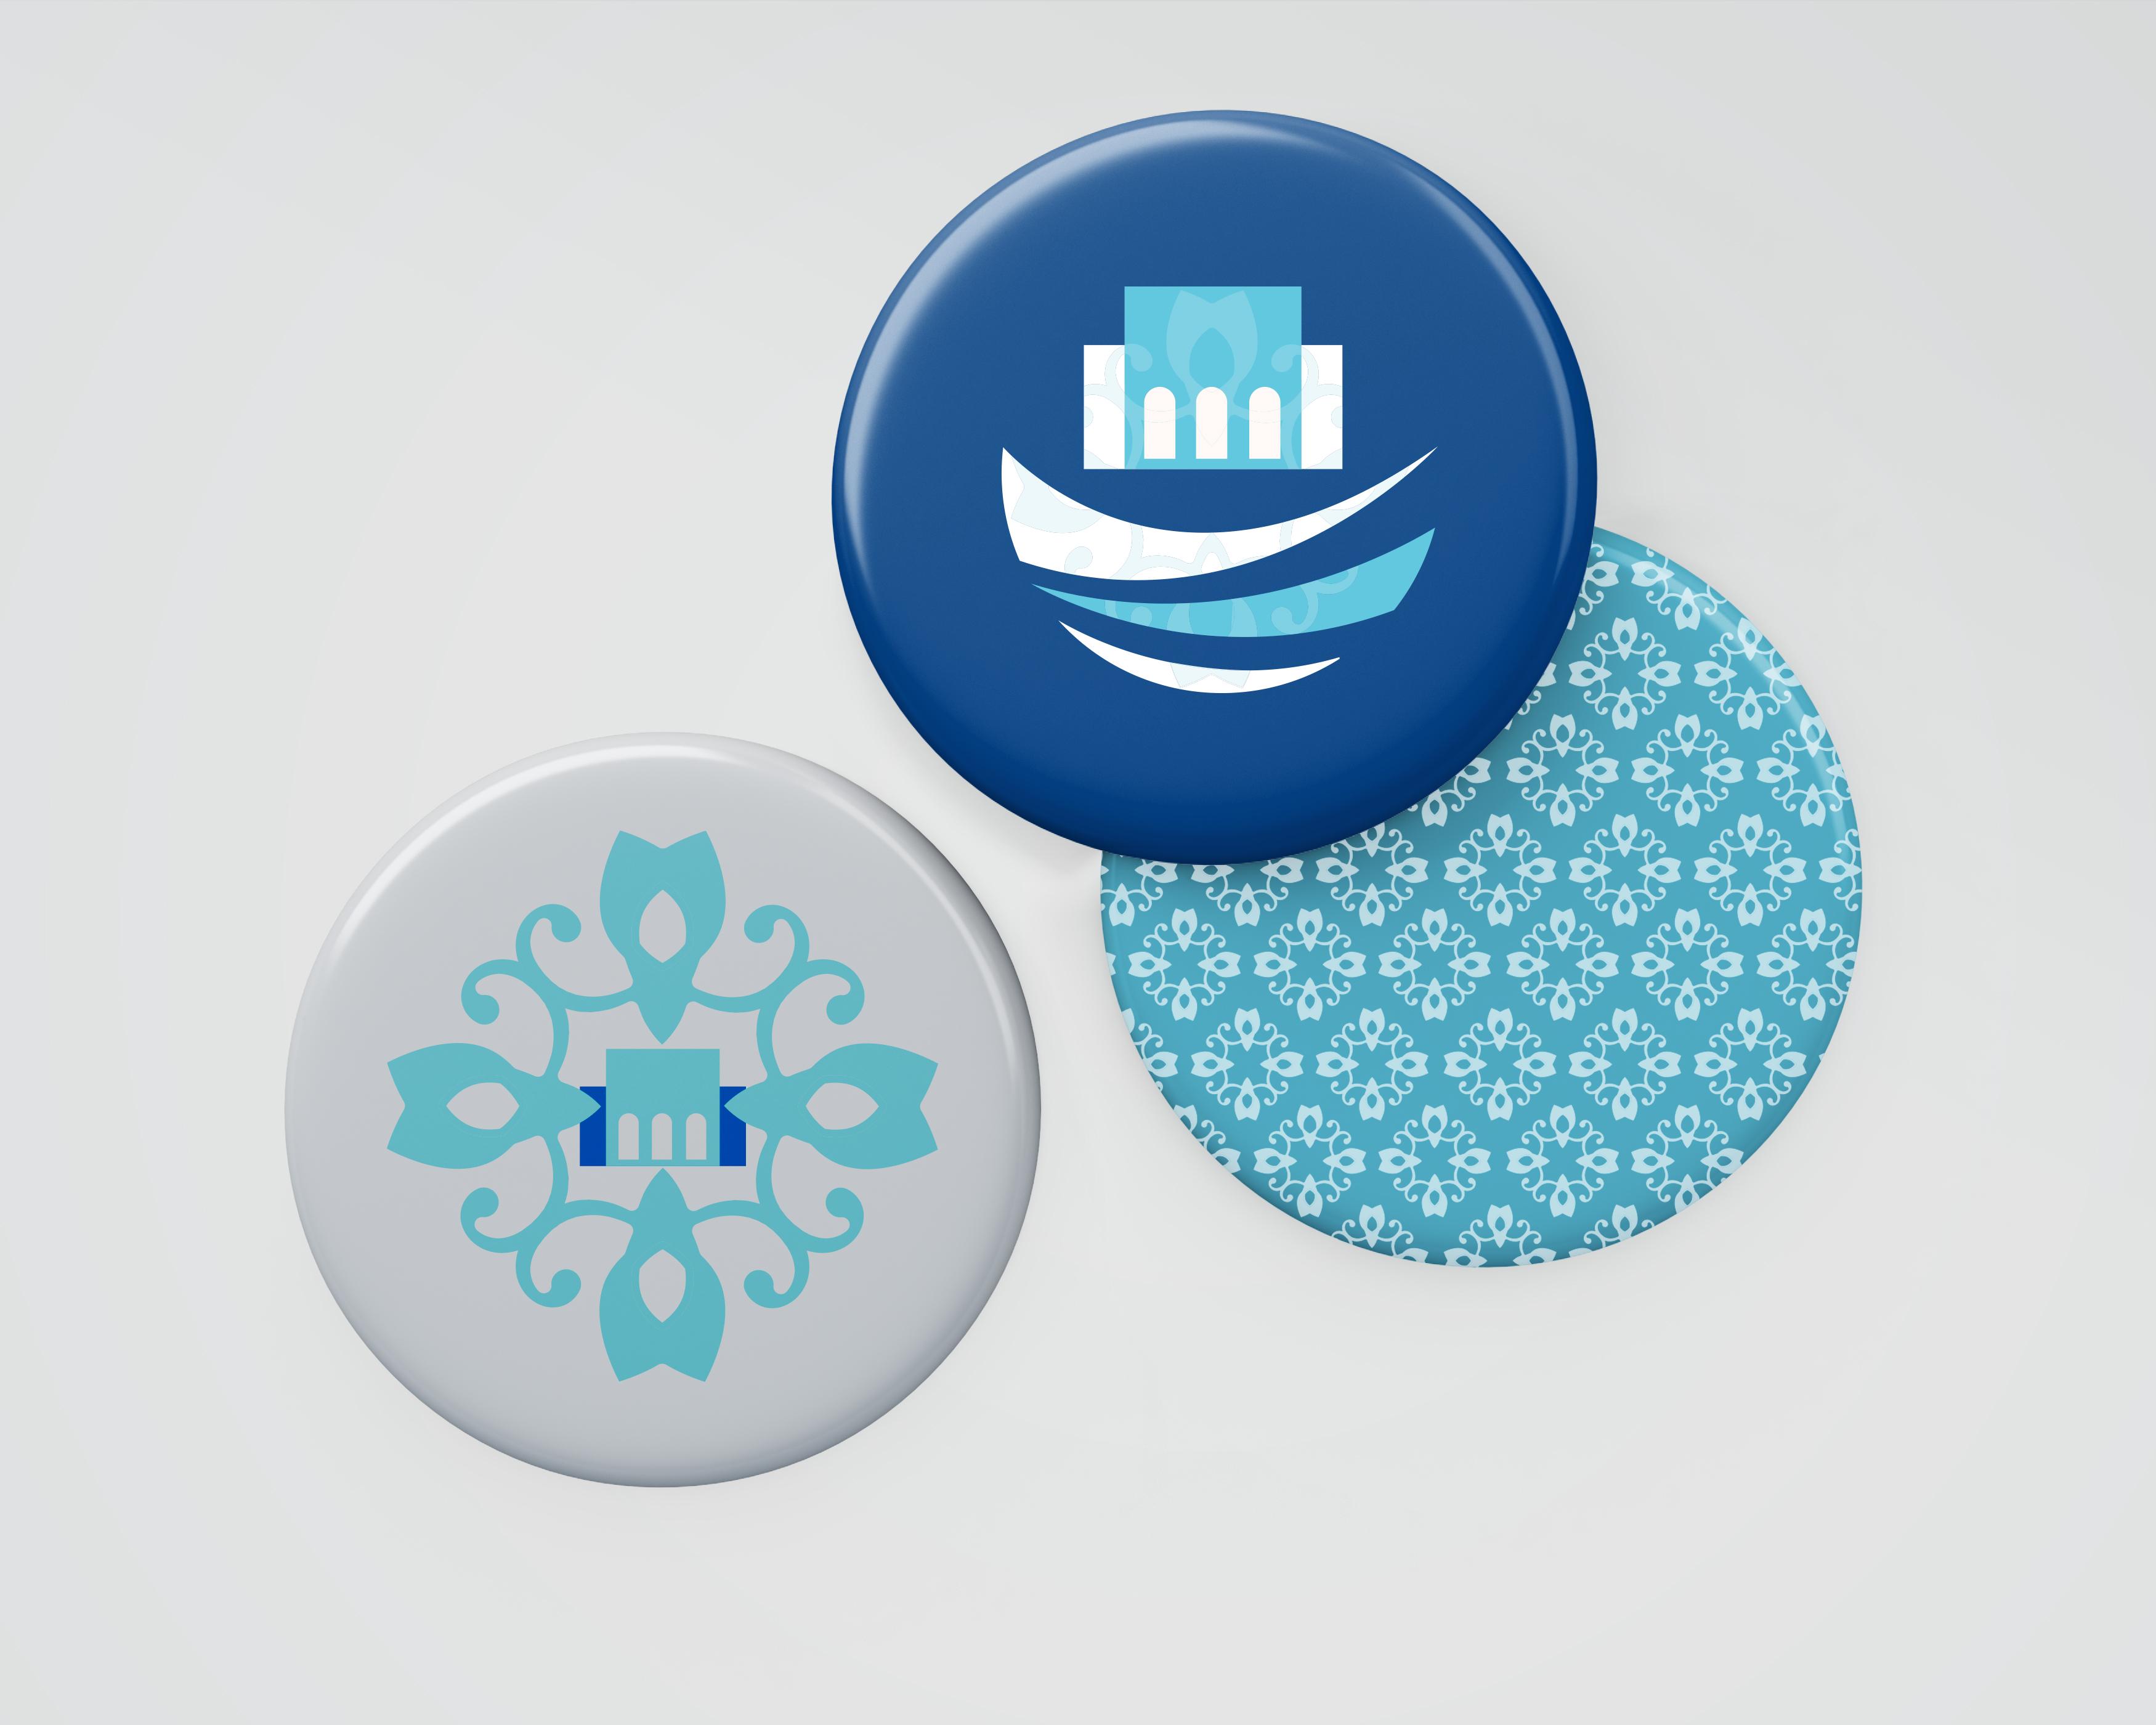 Logo applied on badges